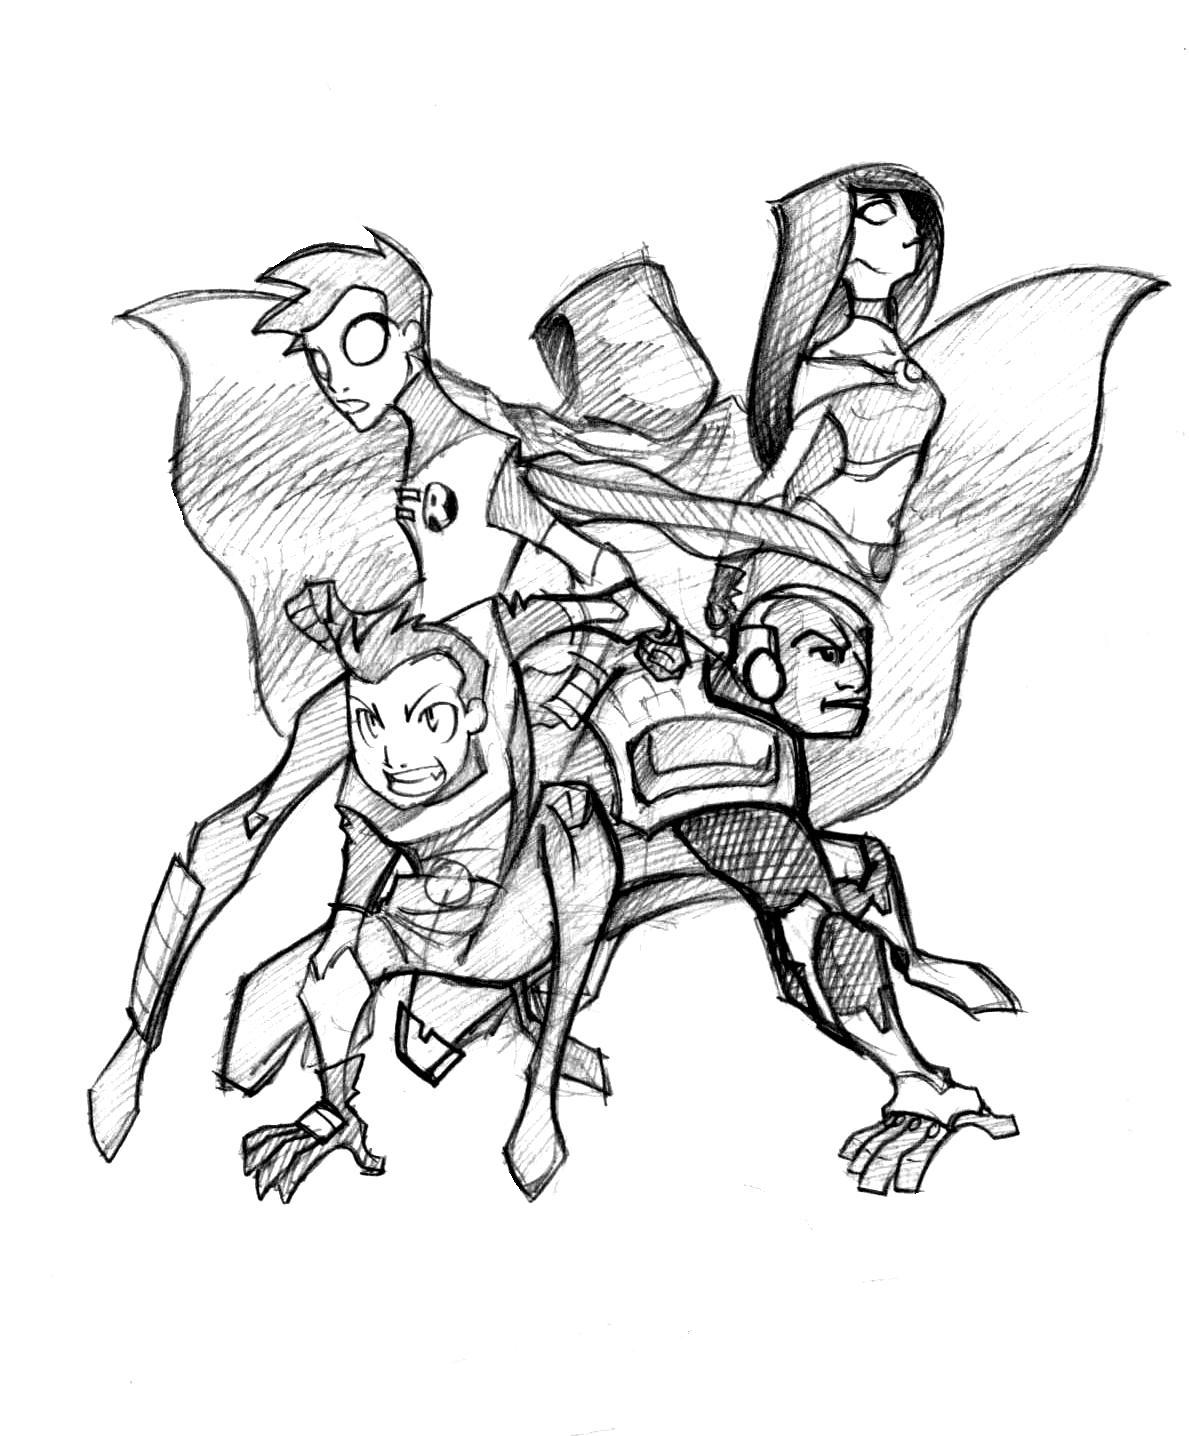 Teen Titans Doujinshi Pin Up by ~splendidriver on deviantART